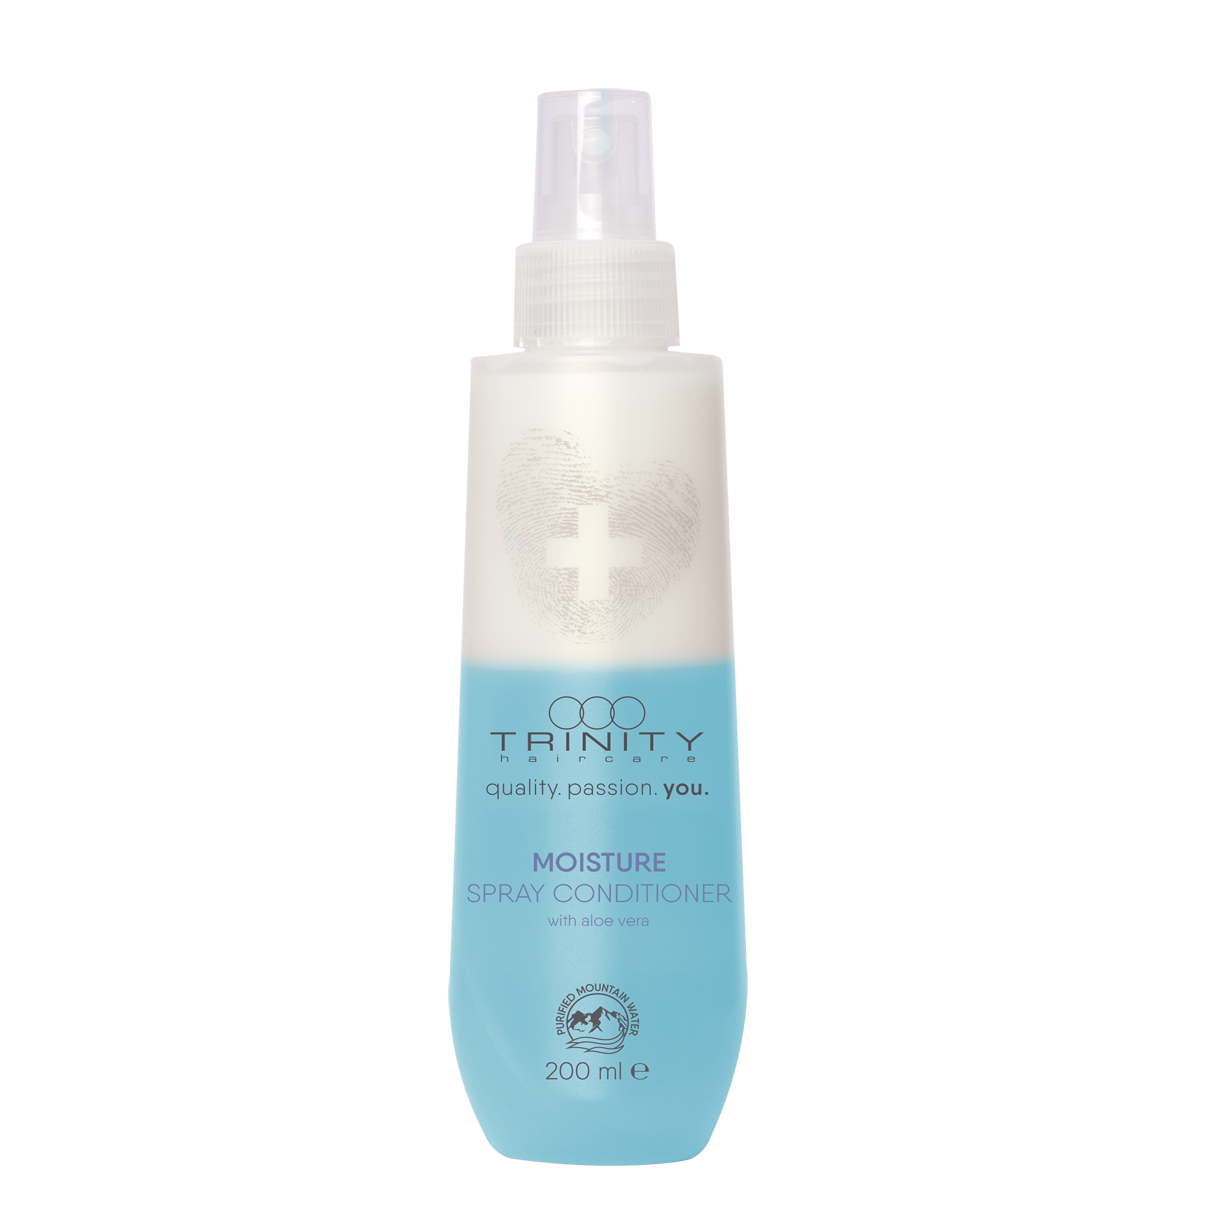 Фото - Trinity Hair Care Спрей-Кондиционер Essentials Moisture Spray Conditioner Увлажняющий, 200 мл trinity hair care маска essentials summer mask с уф фильтром 200 мл